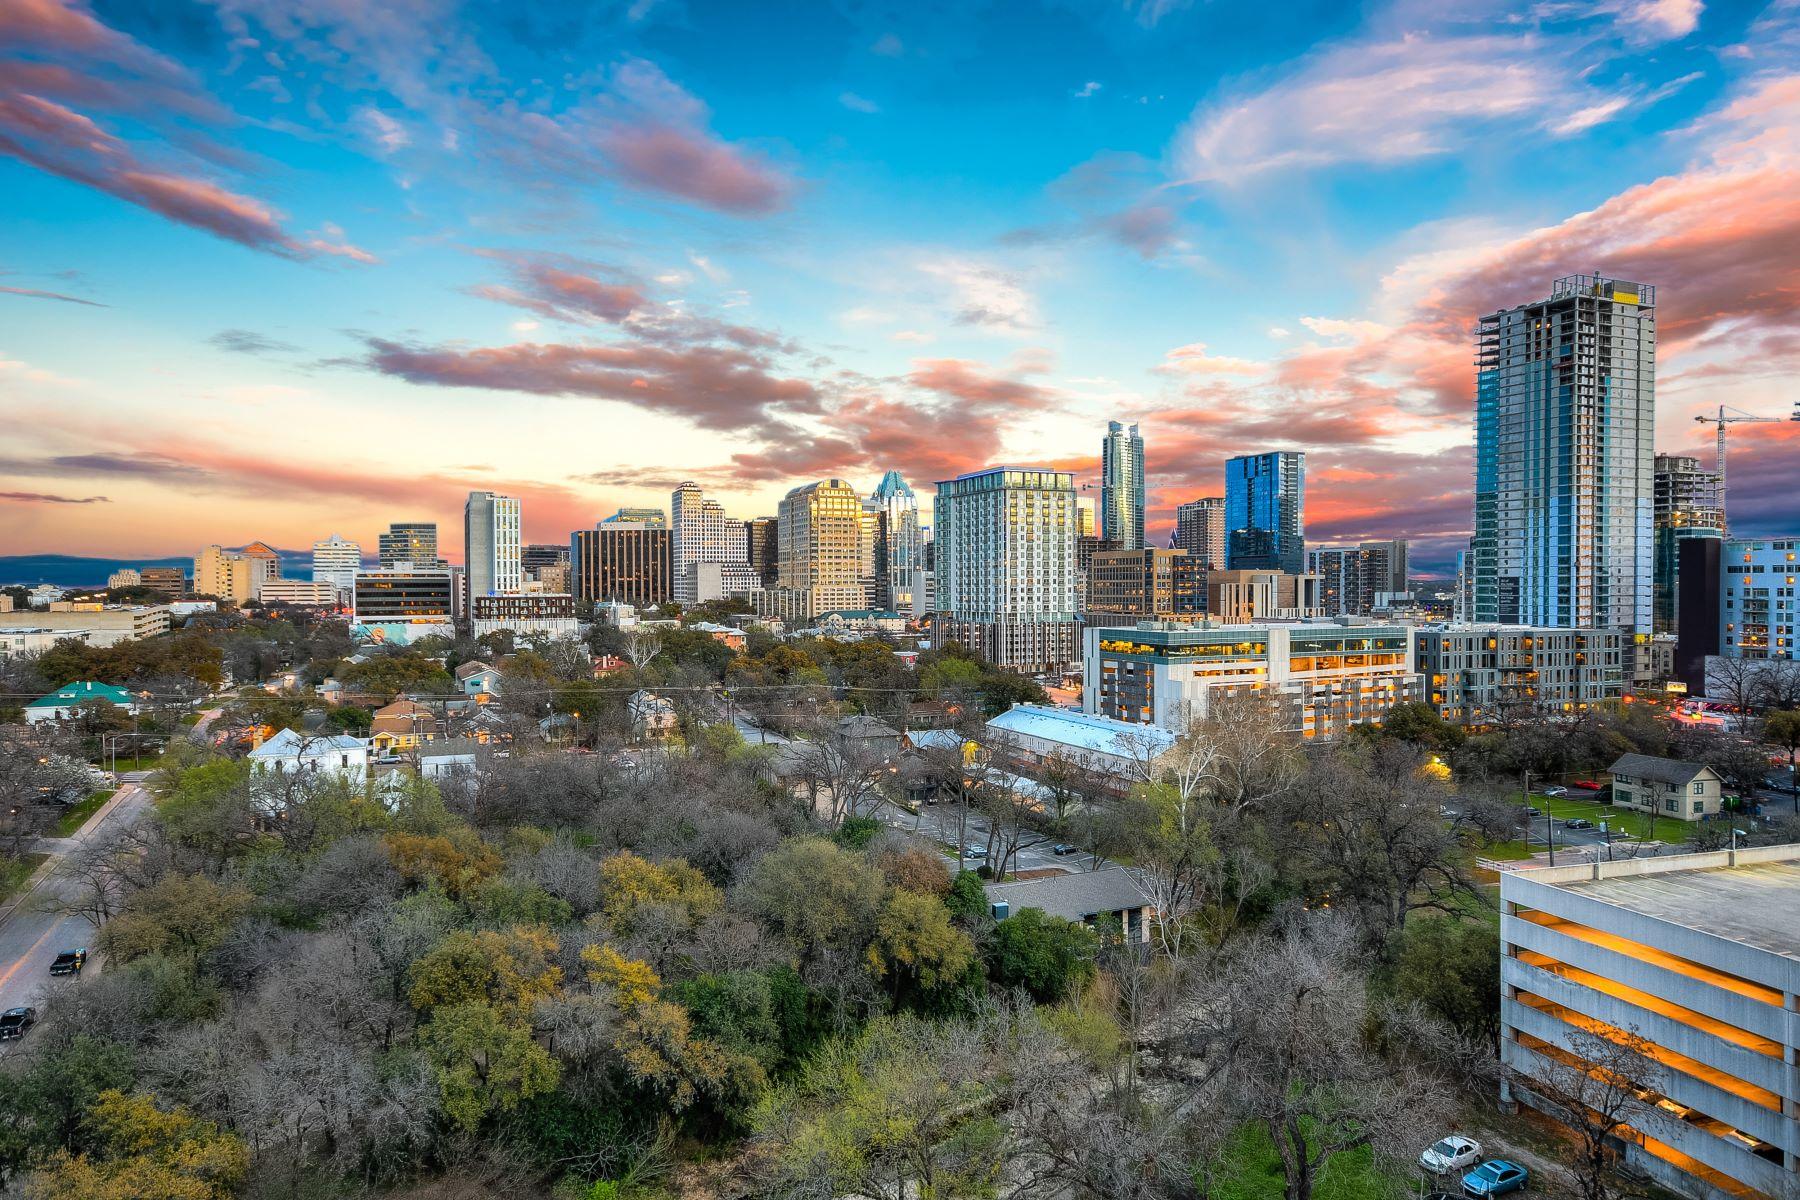 Condominium for Sale at Spectacular Nokonah Penthouse 901 West 9th Street # 1101 Austin, Texas 78703 United States